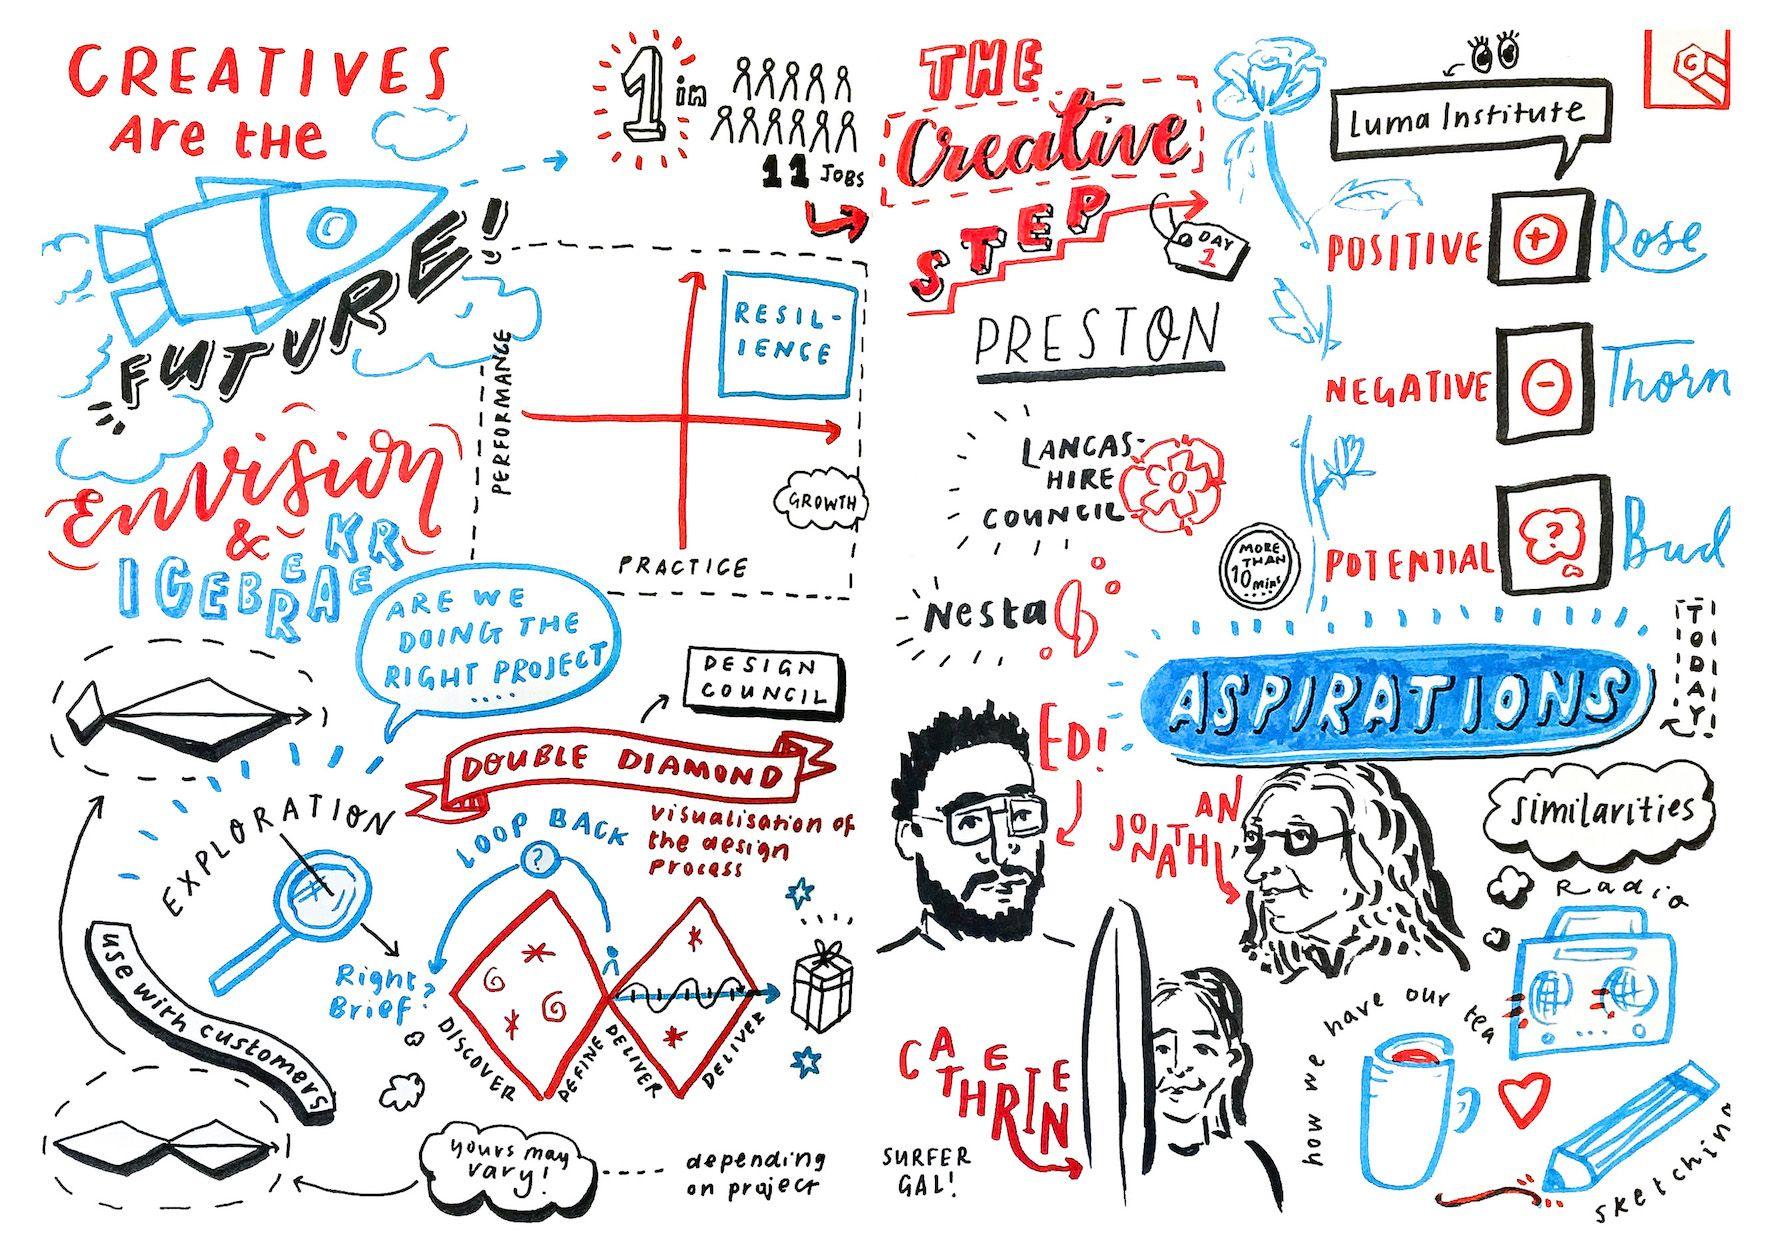 The Creative Step Autumn Cohorts